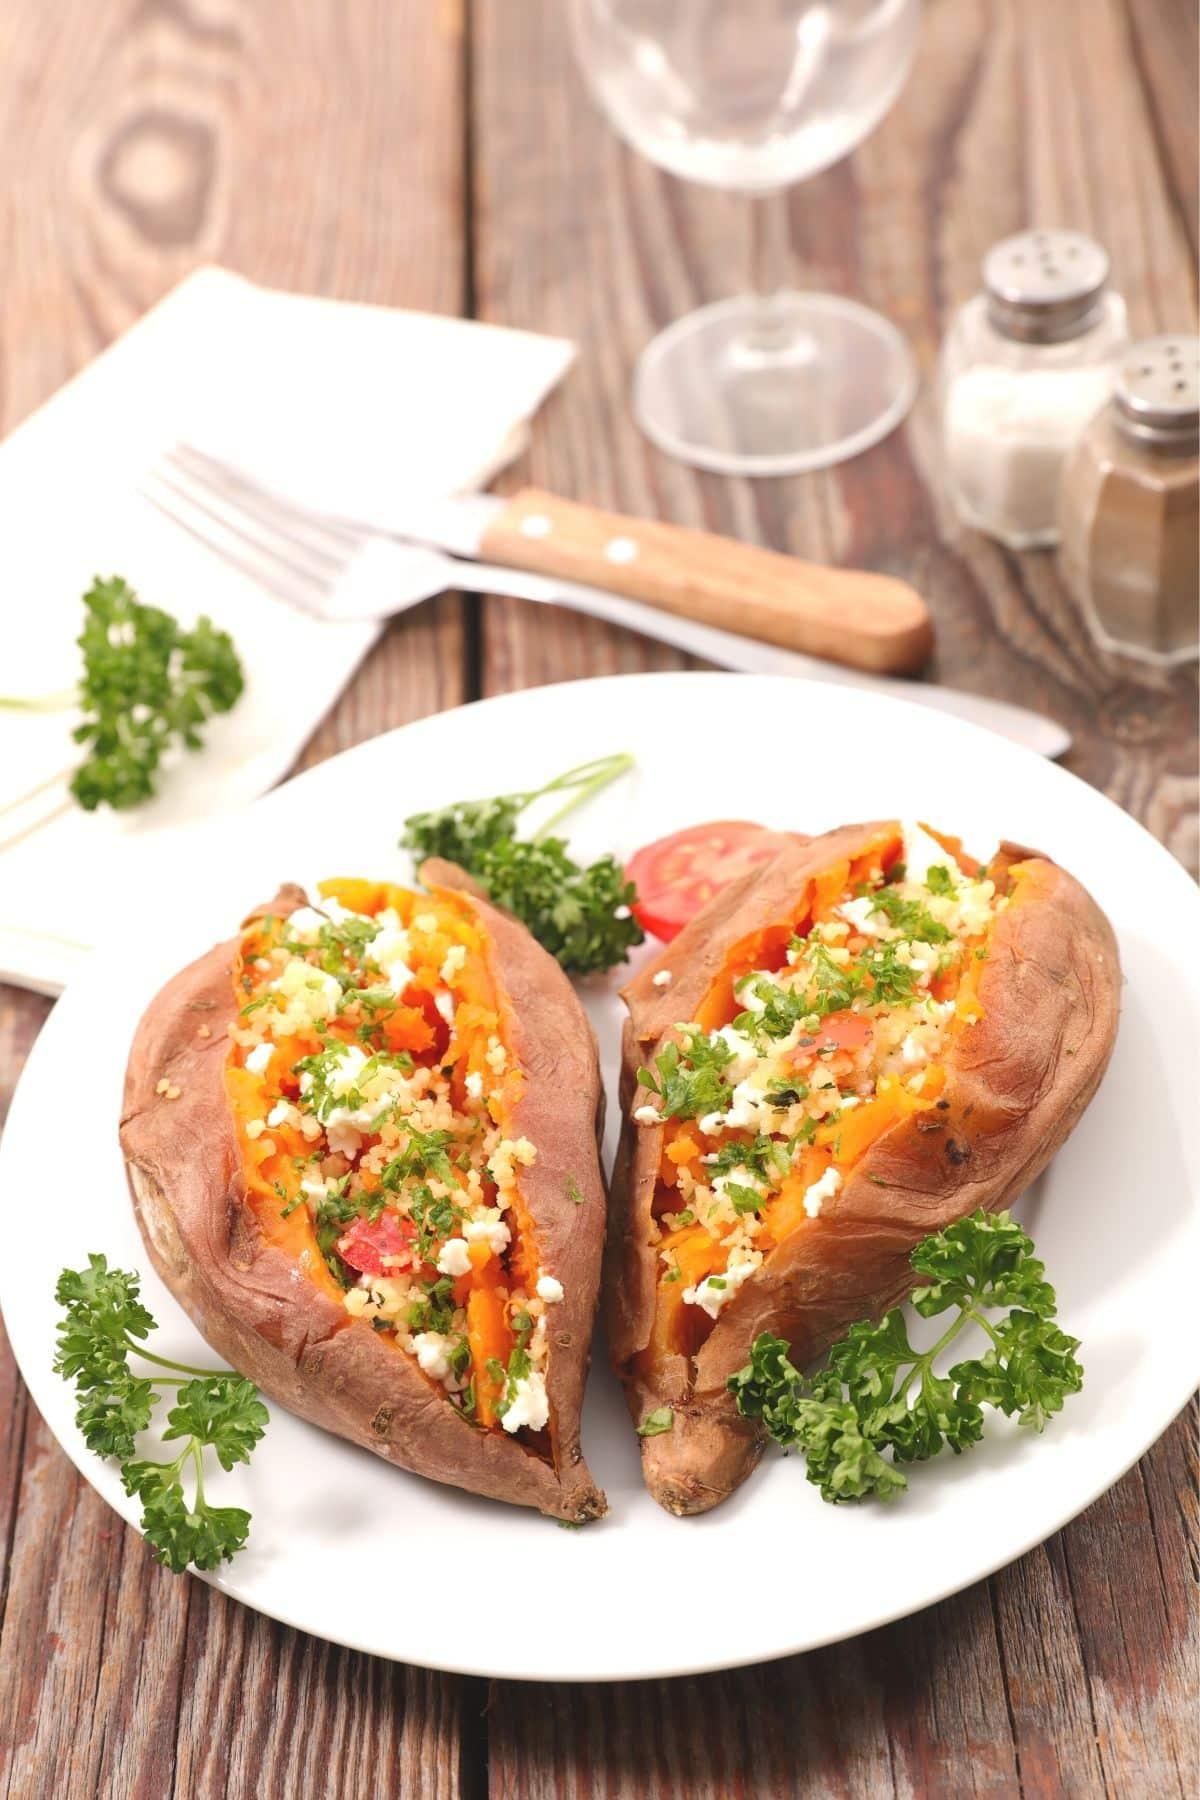 stuffed sweet potatoes served on a  plate